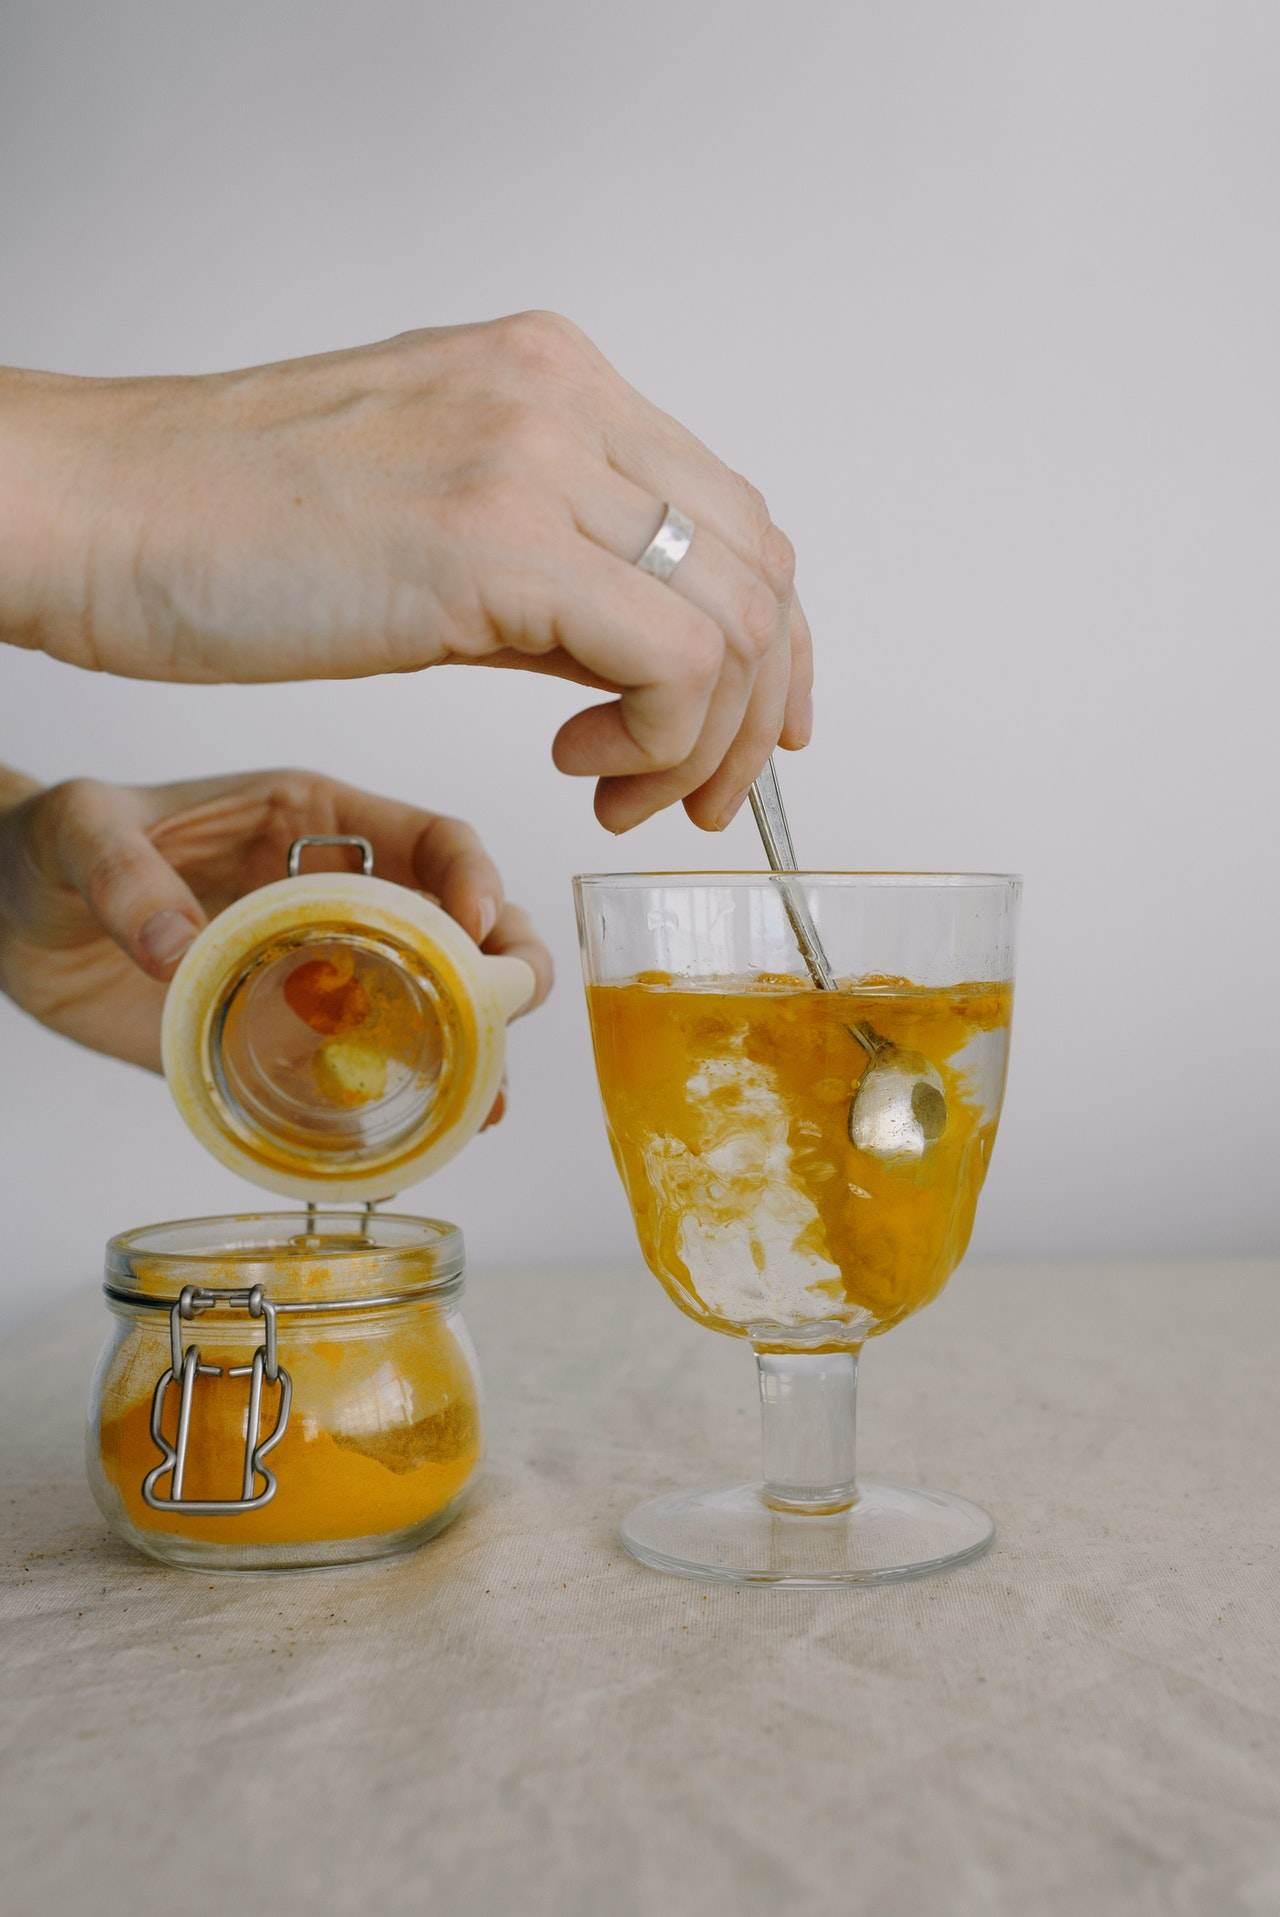 jenis teh herbal untuk atasi rasa cemas